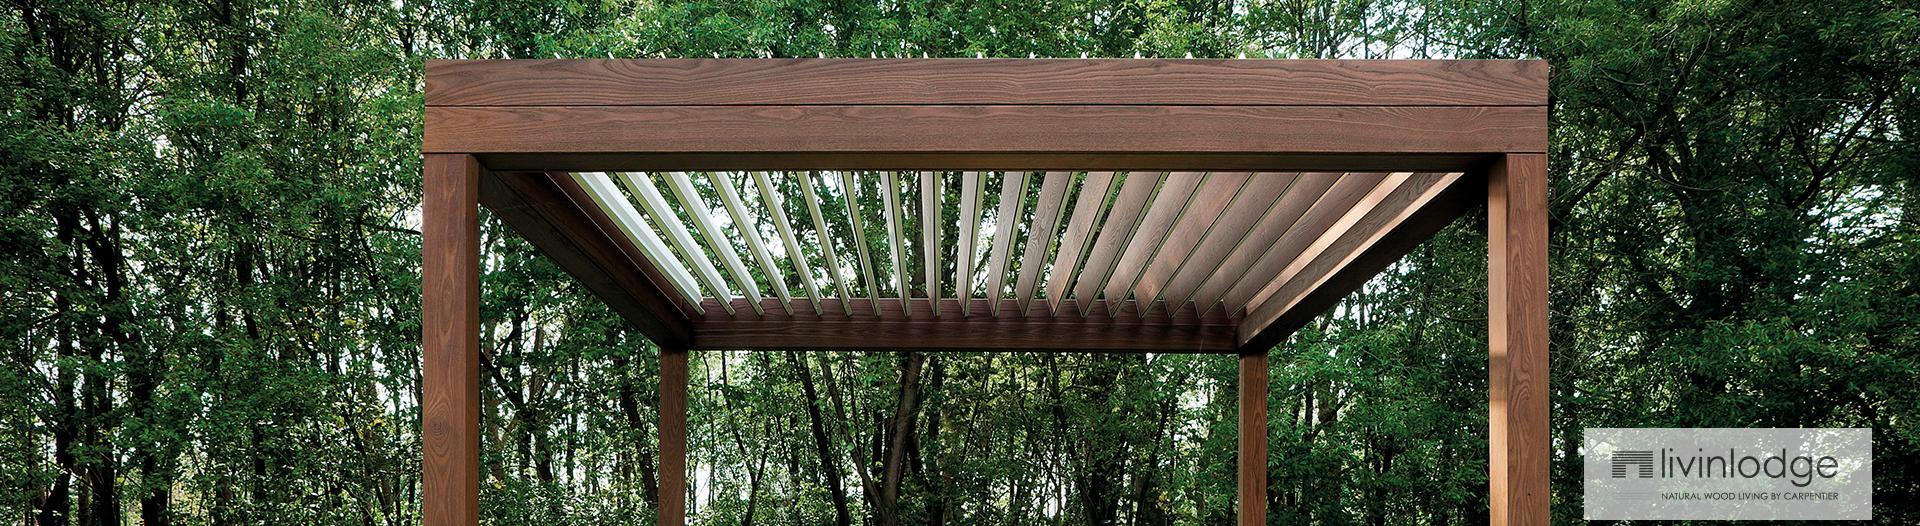 pergola lames orientables en bois livinshades by. Black Bedroom Furniture Sets. Home Design Ideas